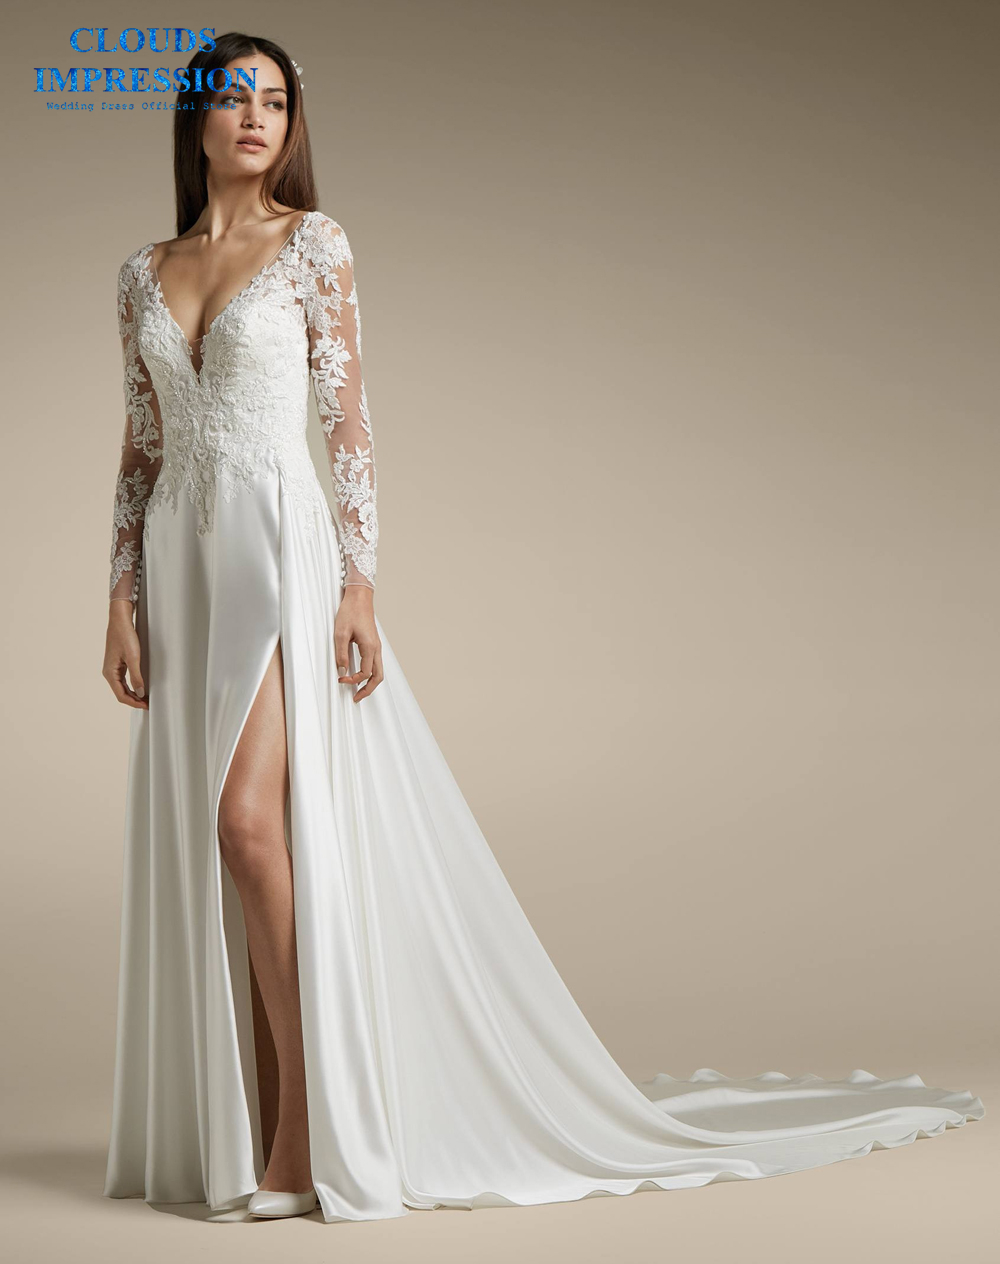 CLOUDS IMPRESSION Sexy Deep V neck A Line Wedding Dress 2019 Lace Beading Lustrous Satin Bridal